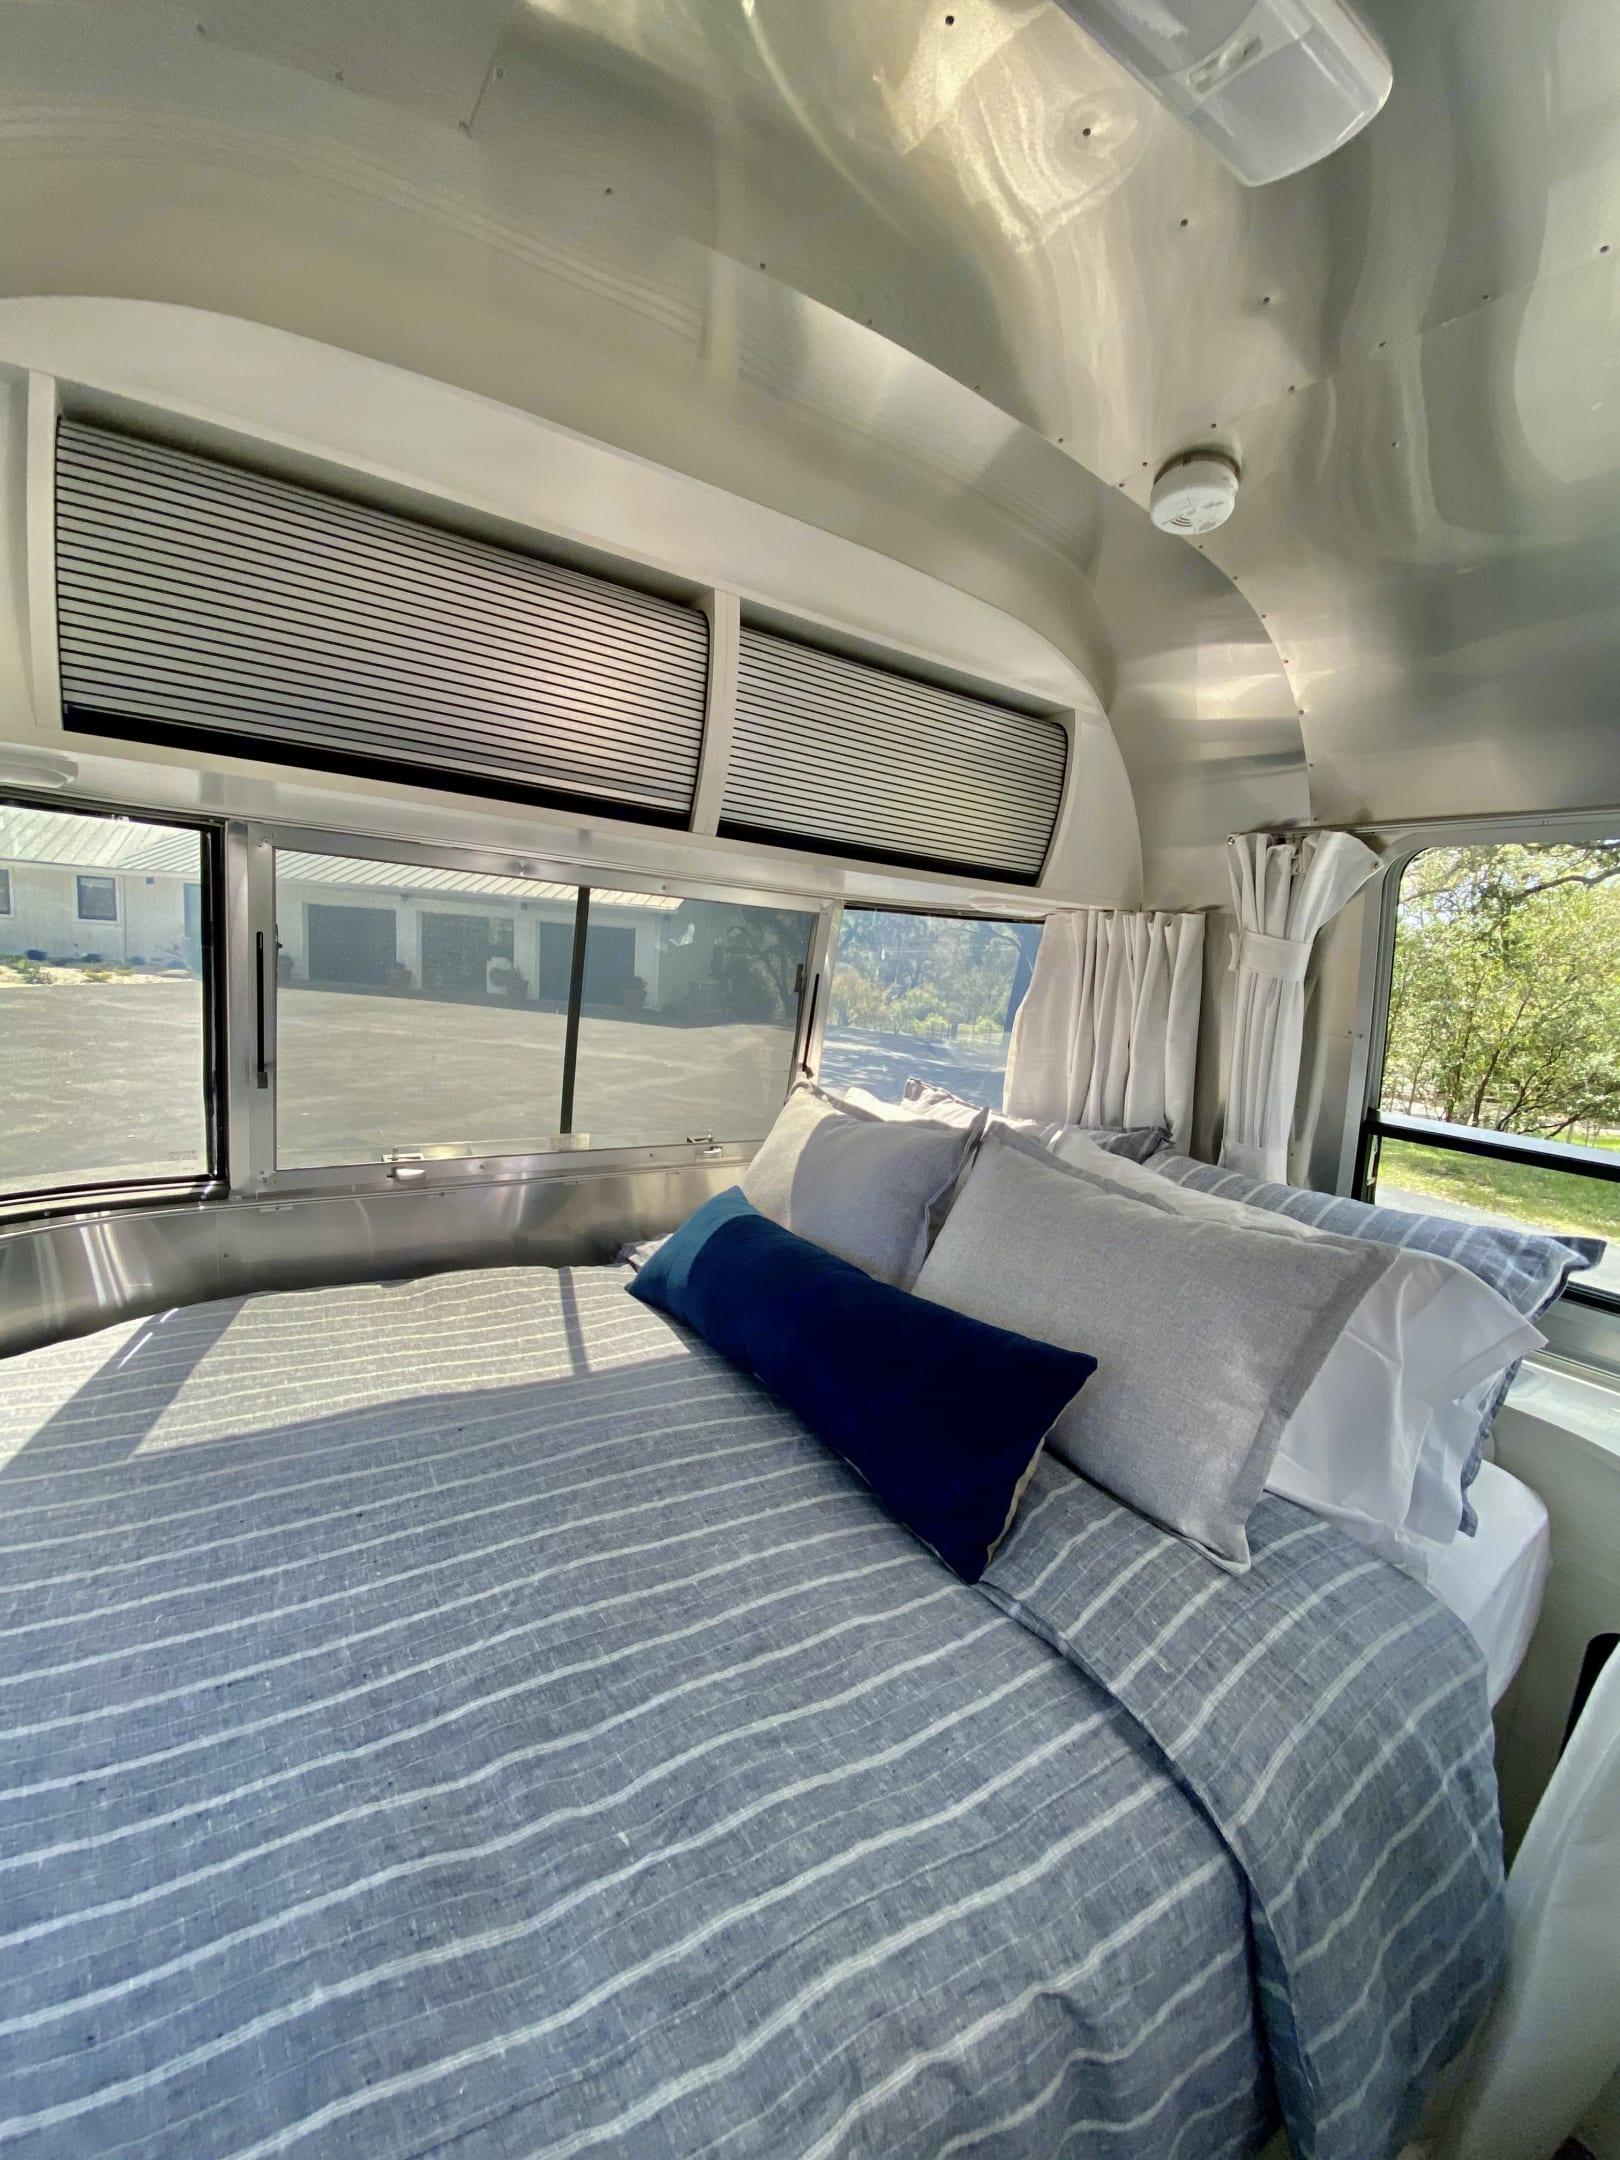 Restoration Hardware bed linens and duvet. Airstream Bambi 2020